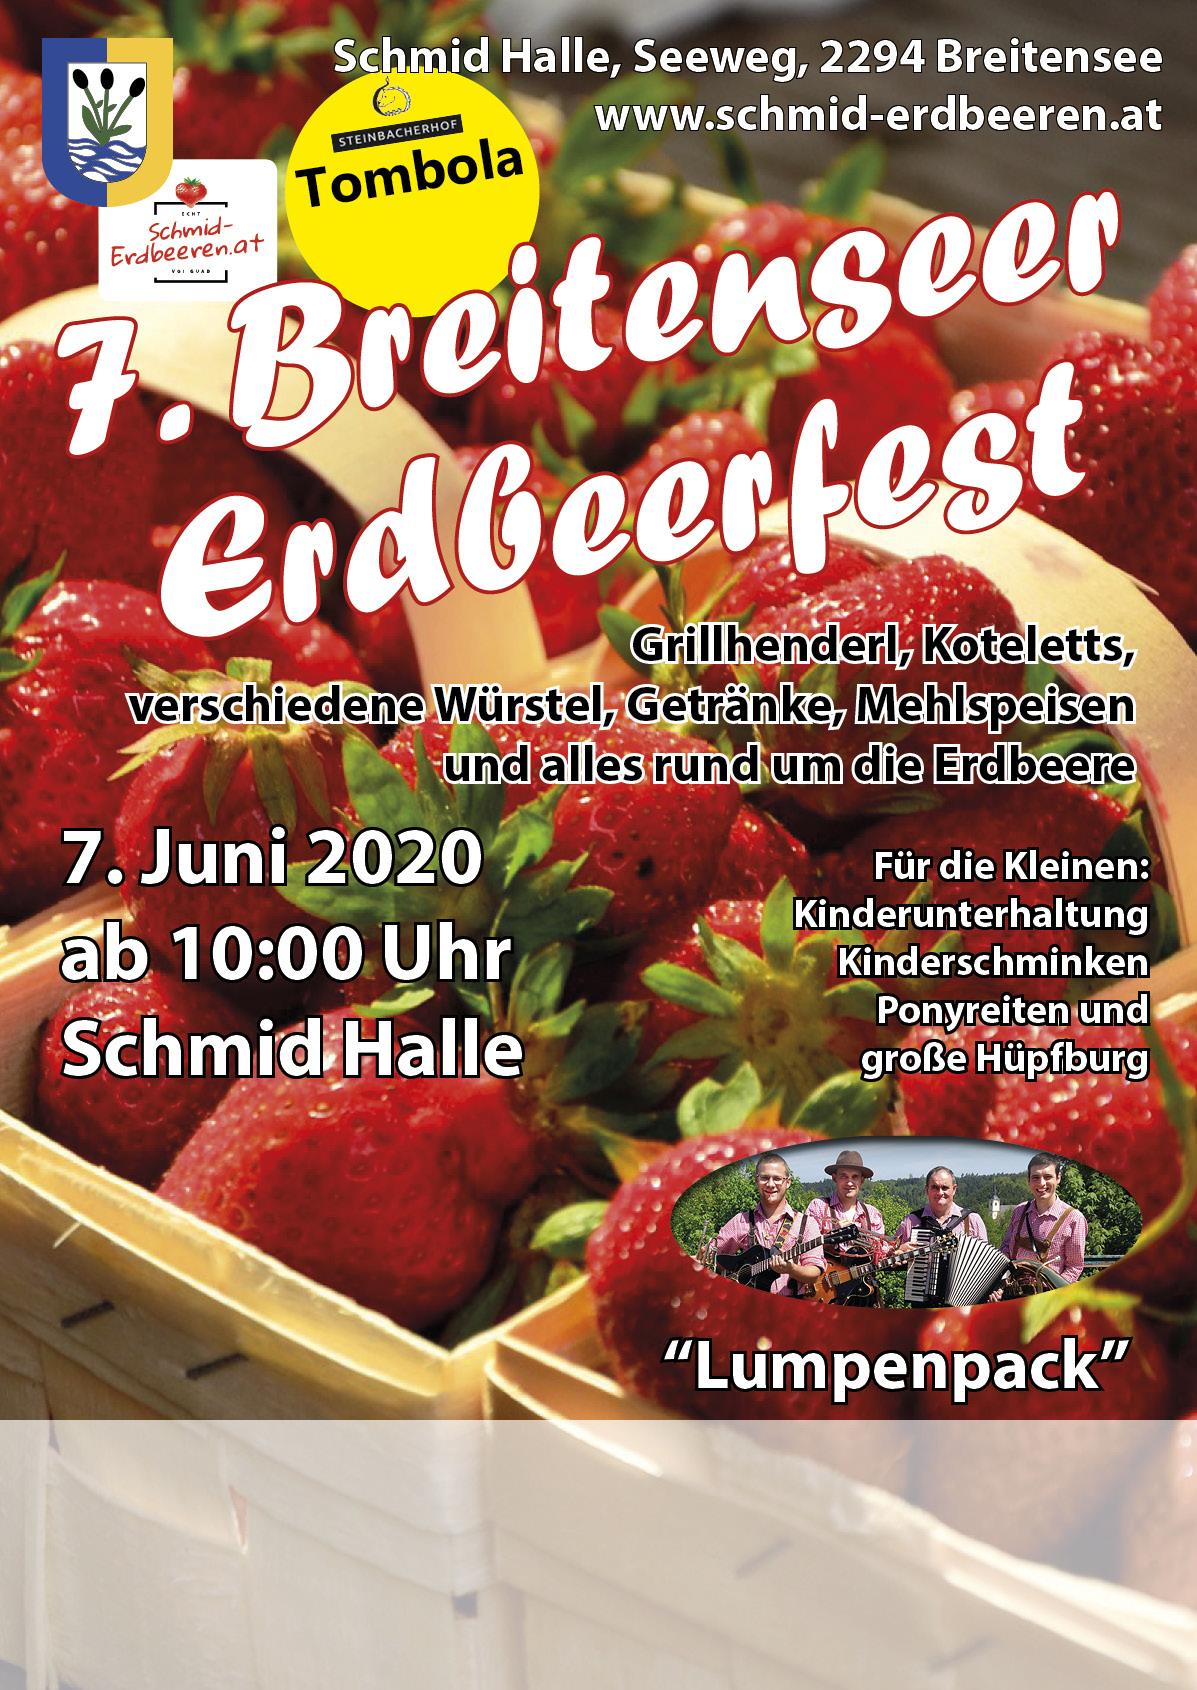 4. Erdbeerfest in Breitensee